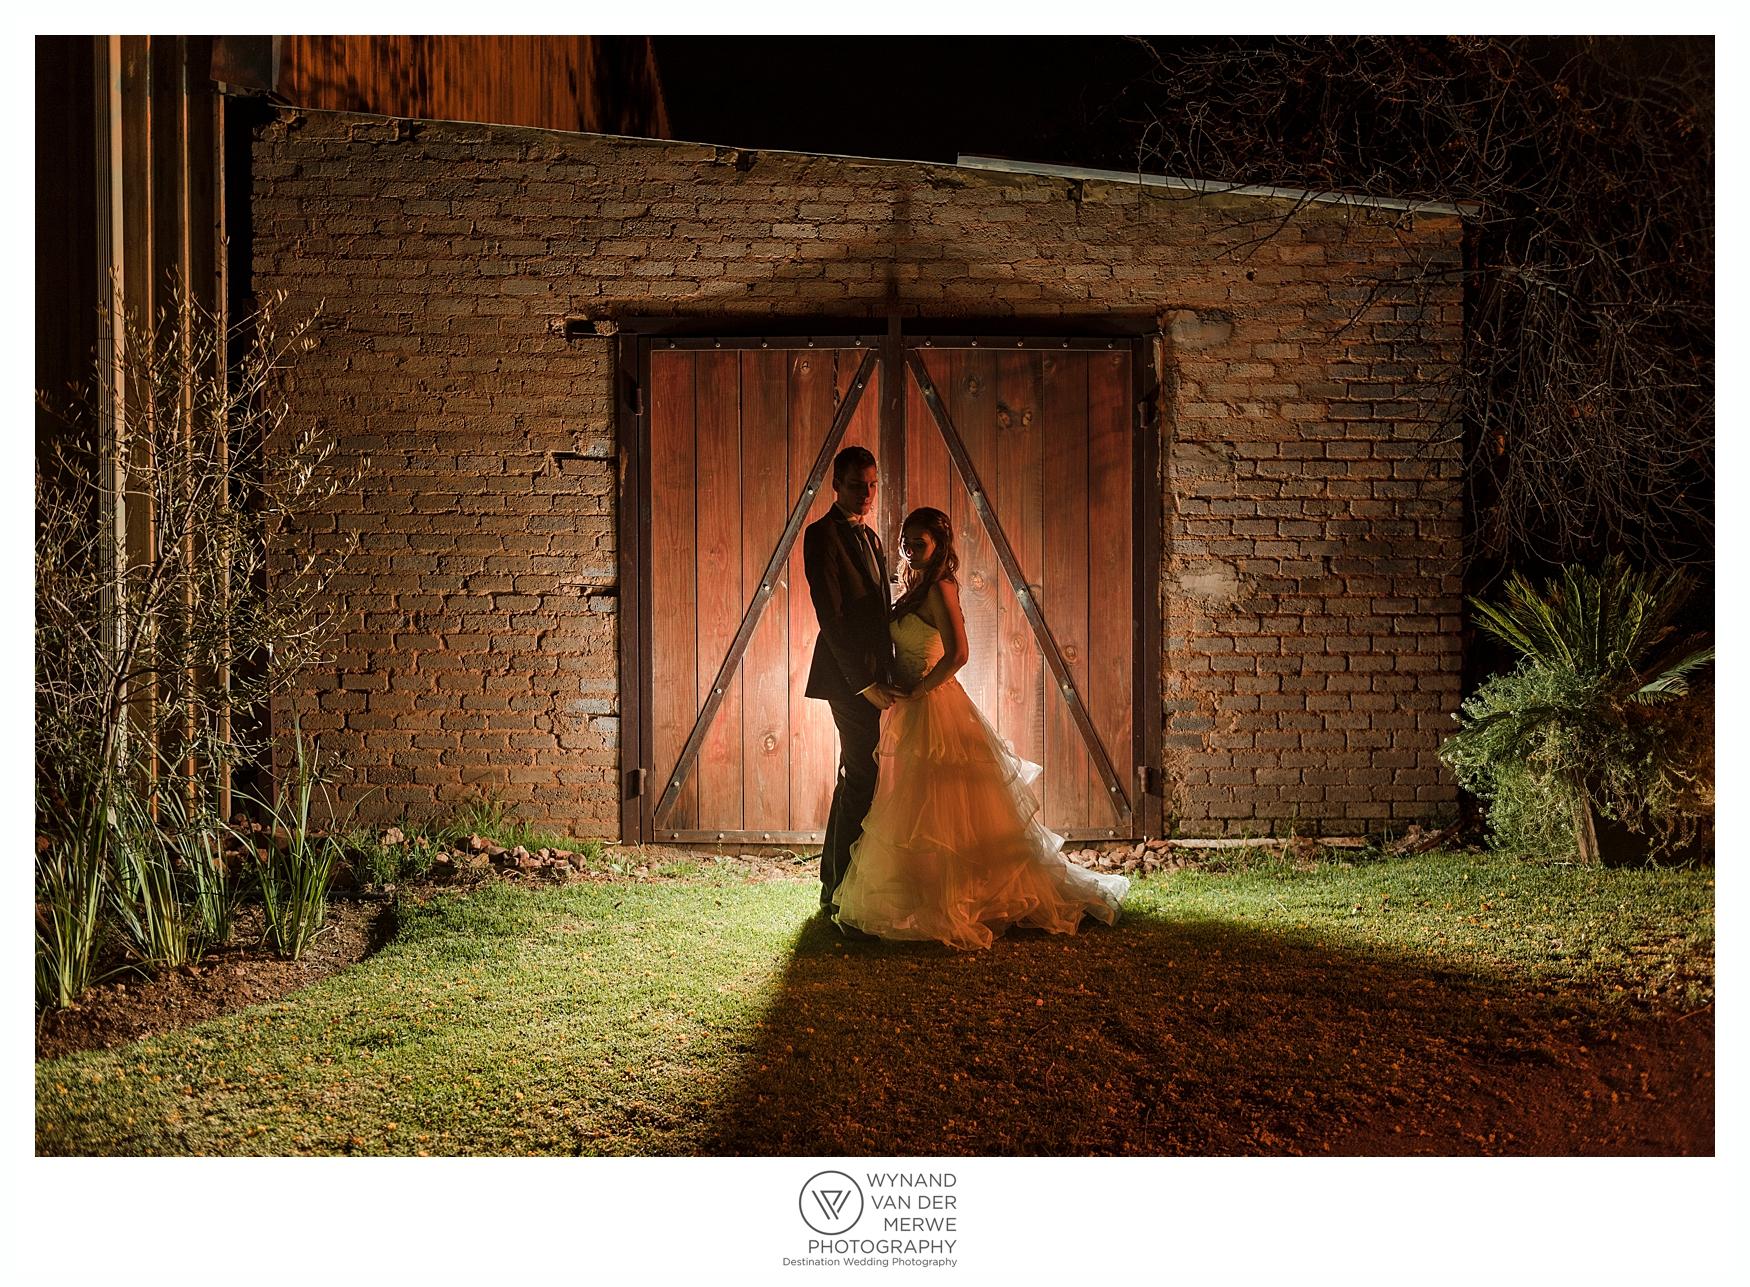 Wynandvandermerwe ryan natalia wedding photography cradle valley guesthouse gauteng-776.jpg